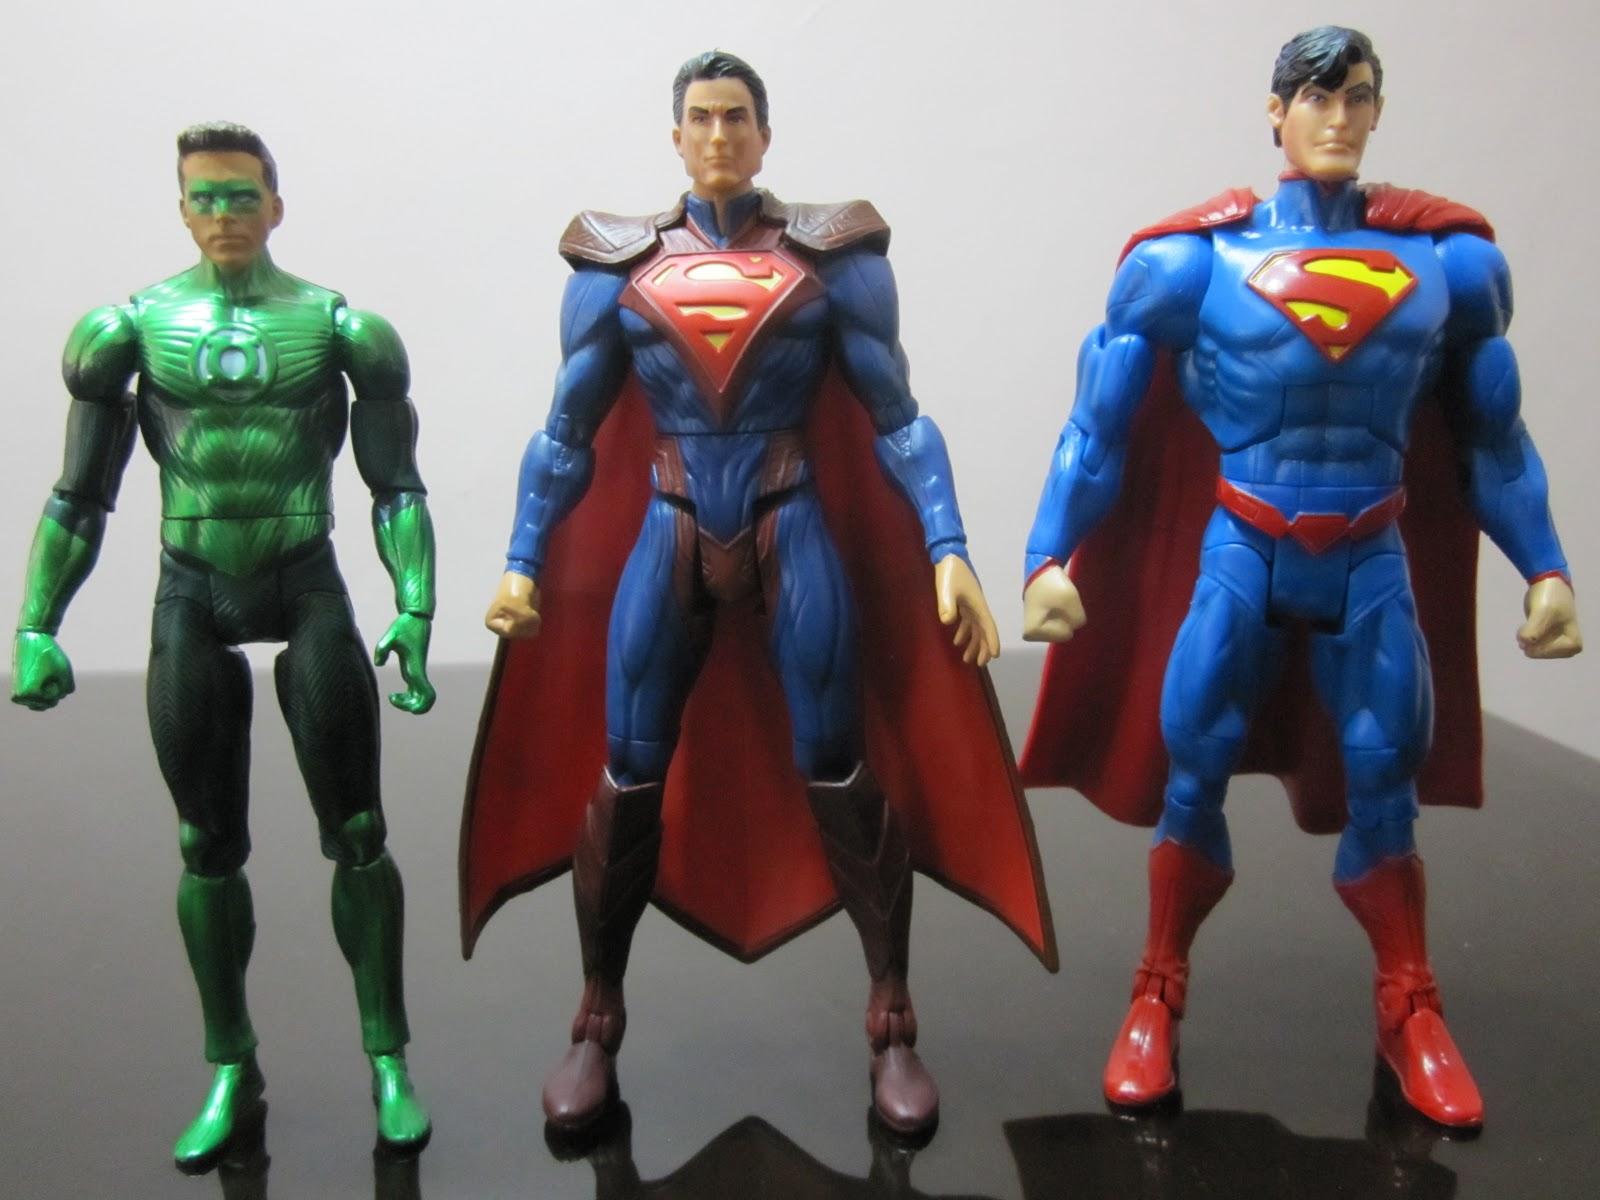 c739be6774df Injustice Superman Action Figure